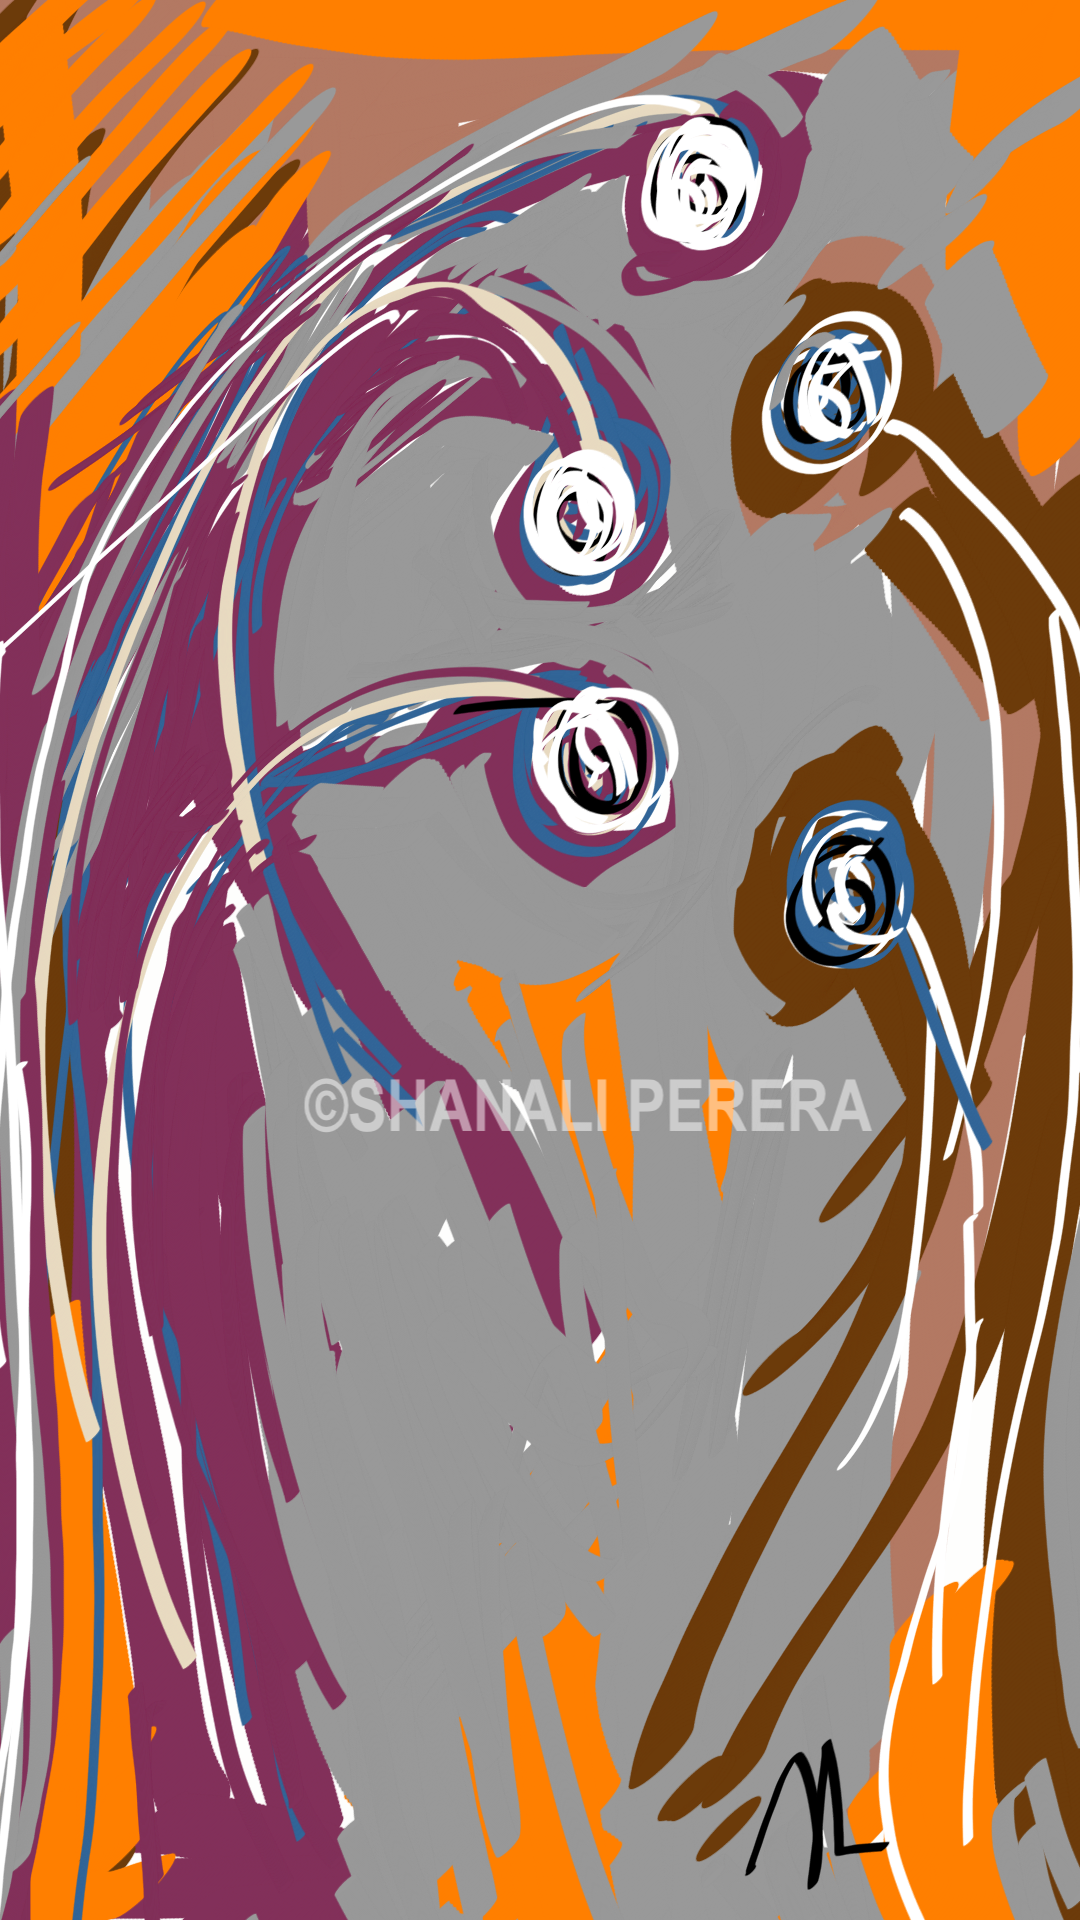 sketch-1508865568642.png